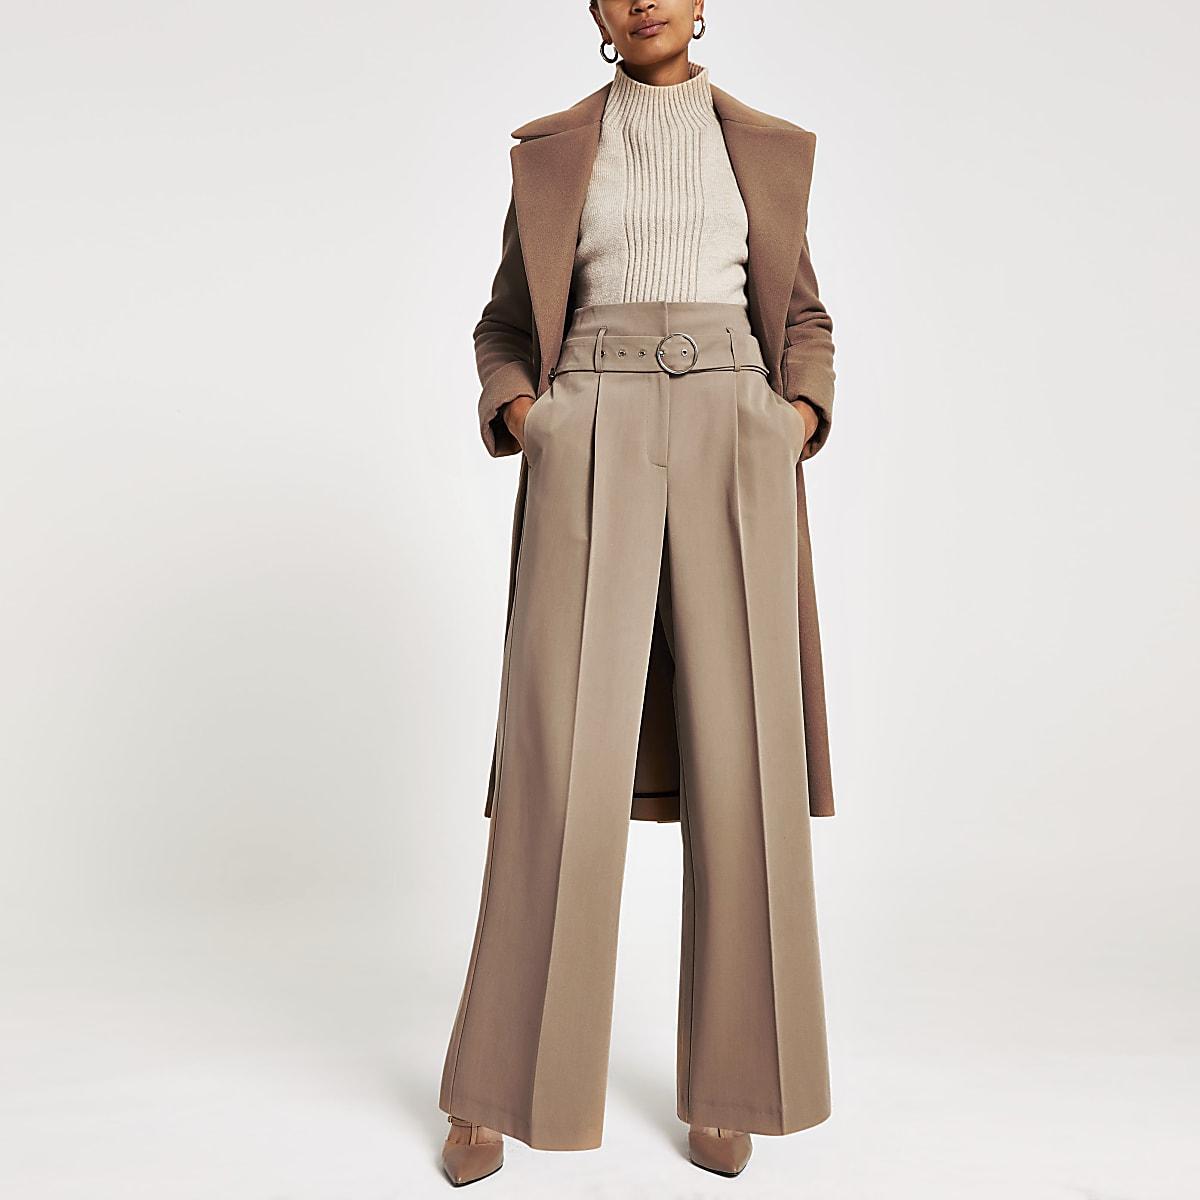 Pantalon large marronà ceinture